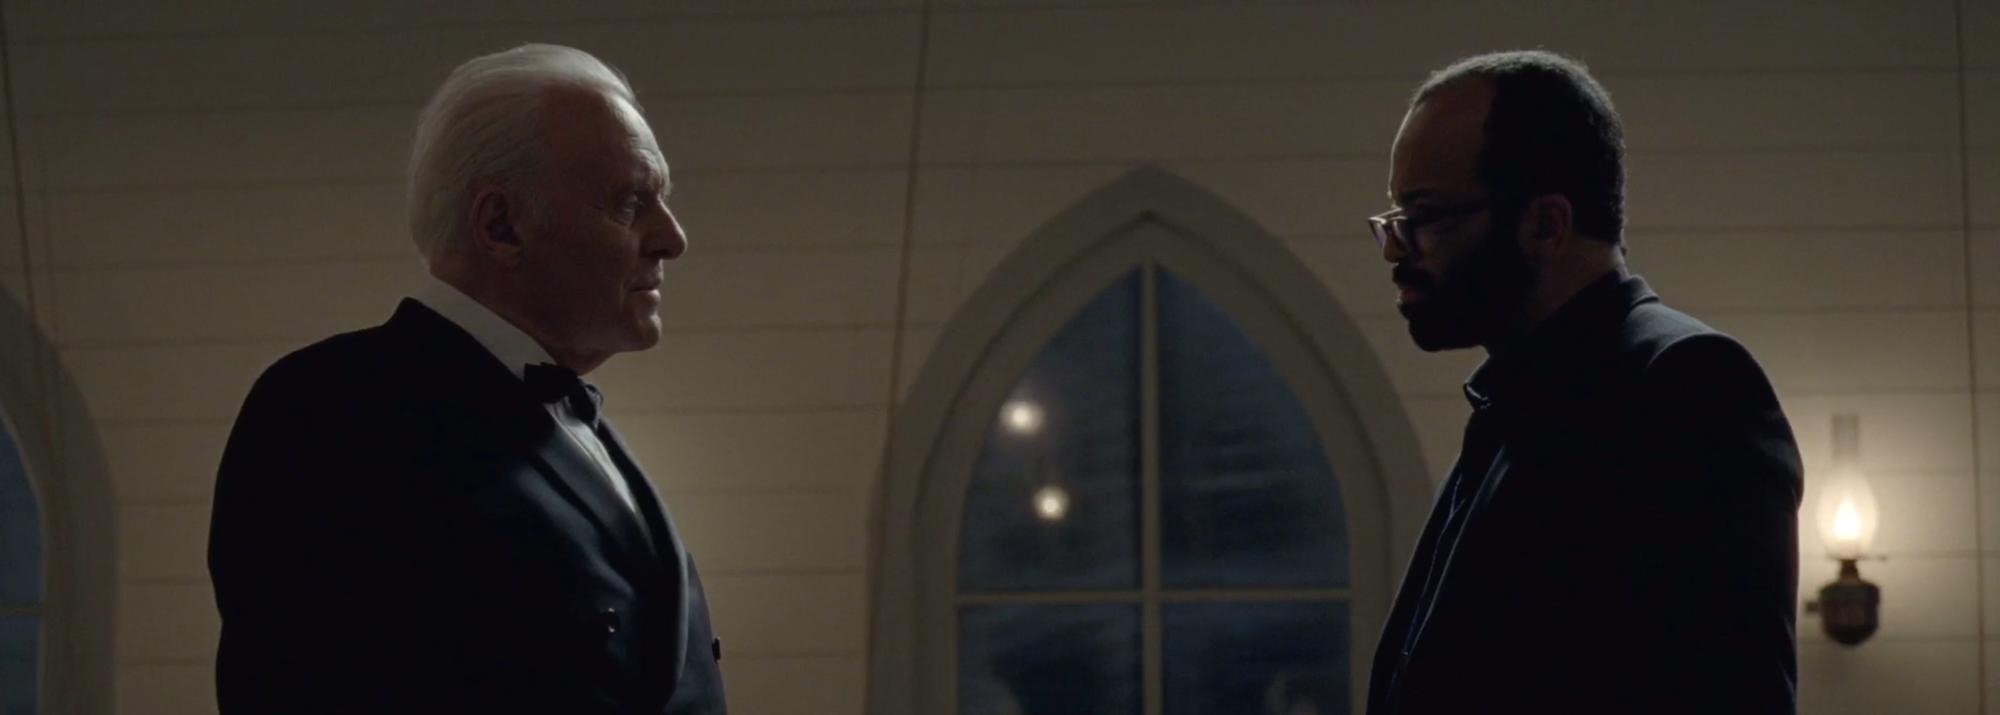 dr ford and bernard in church westworld